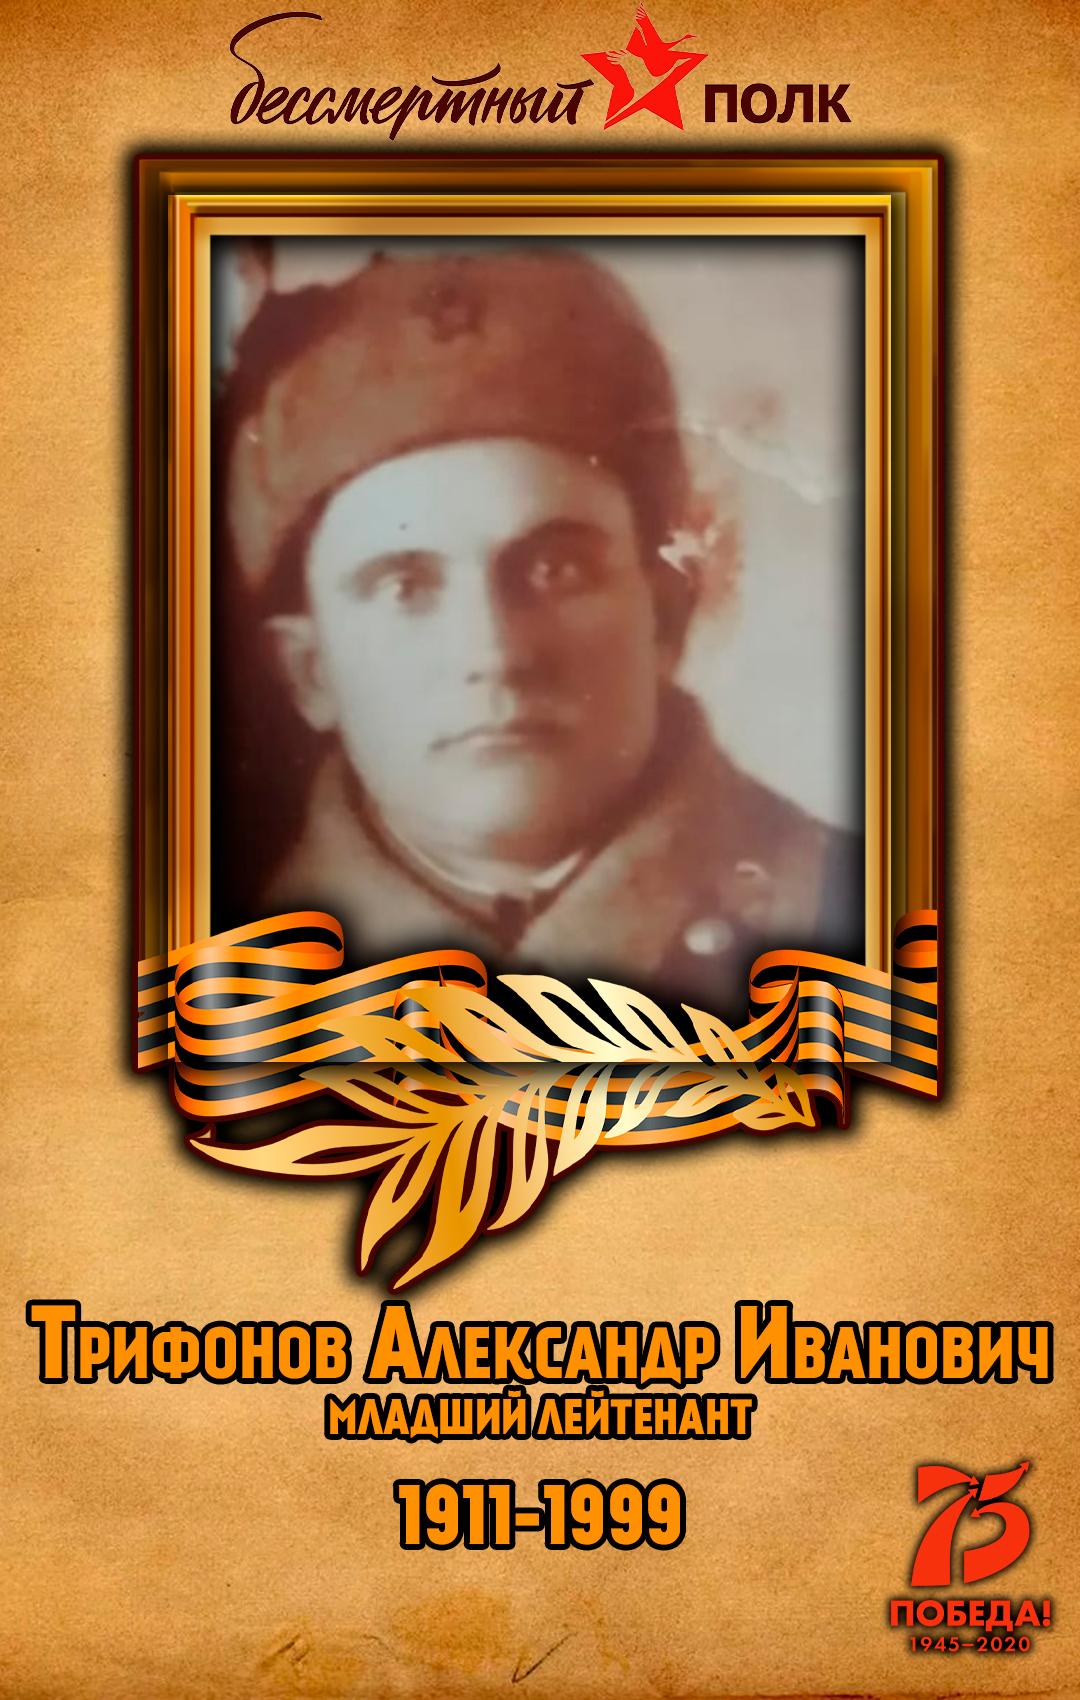 Трифонов-Александр-Иванович